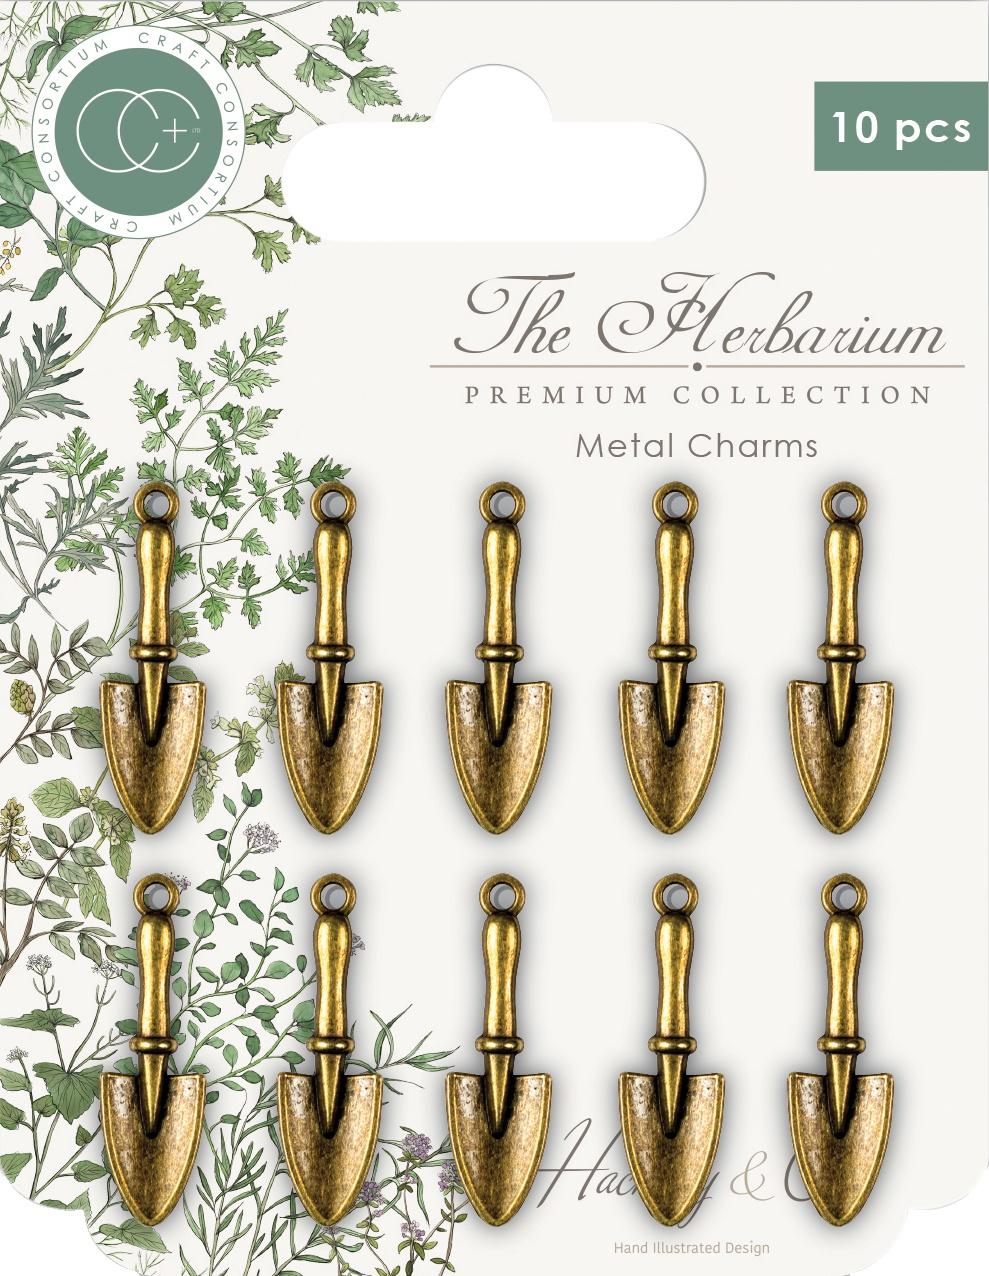 Craft Consortium - The Herbarium Metal Charms: Brass Trowels